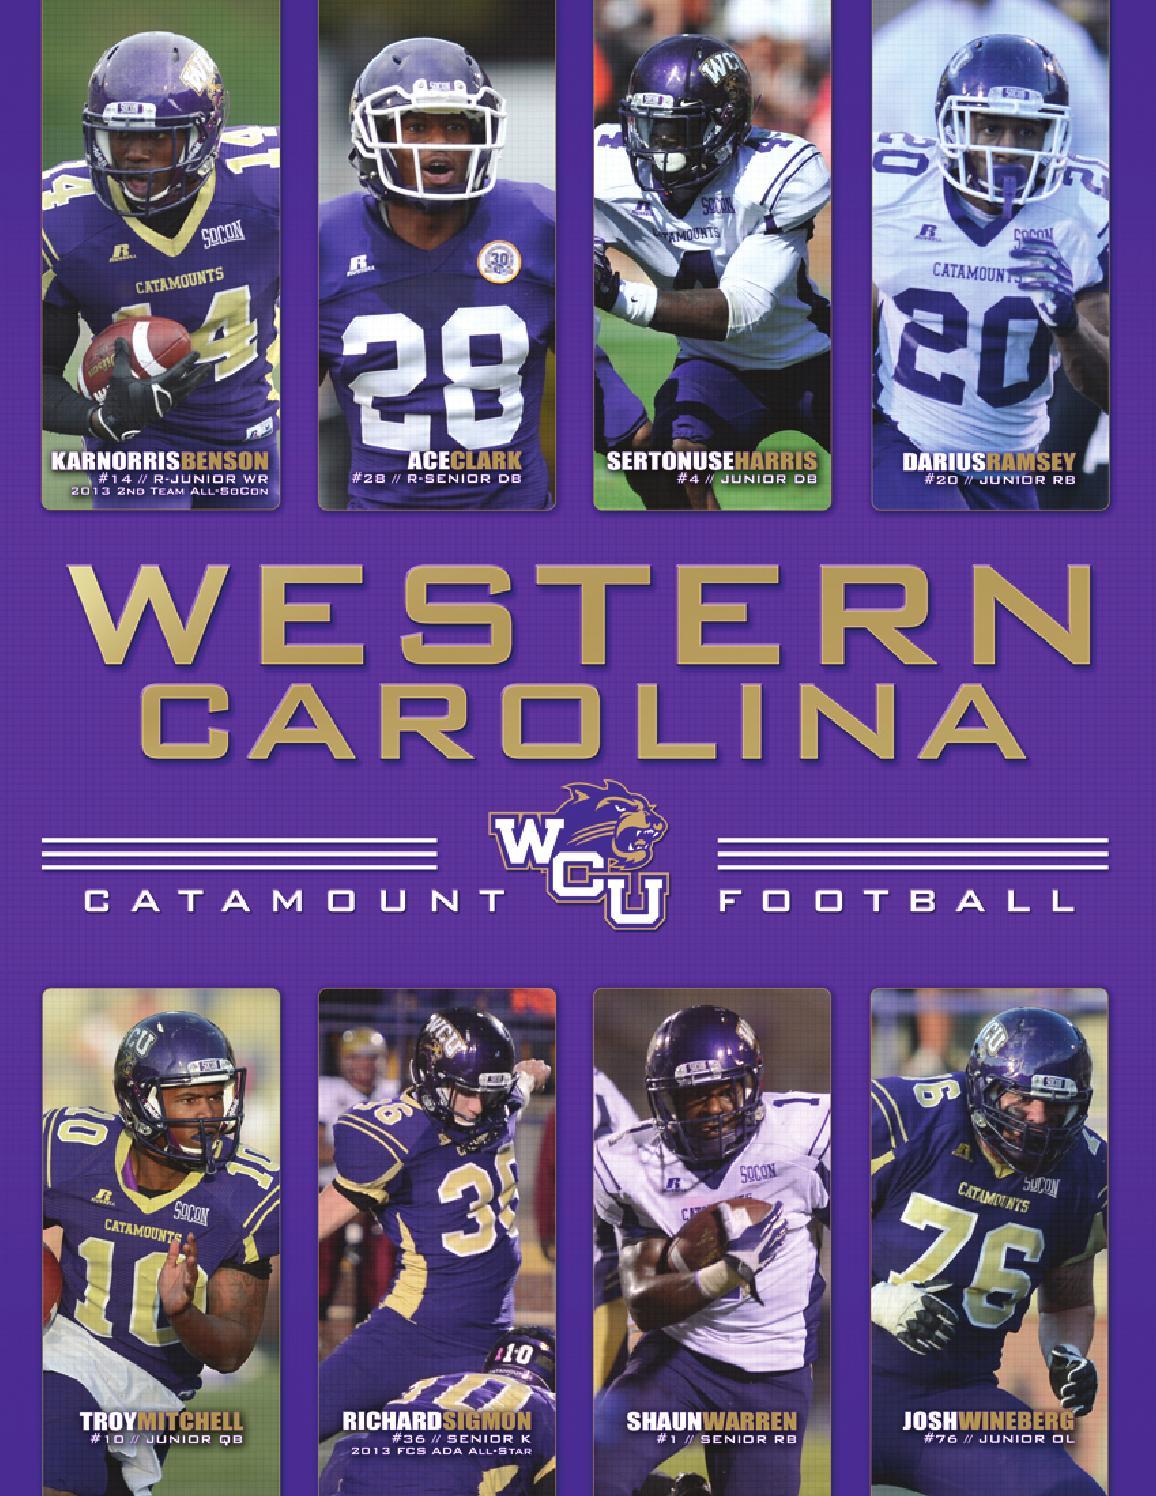 f0232fe79 2014 Western Carolina Football Yearbook by Western Carolina University  Athletics - issuu